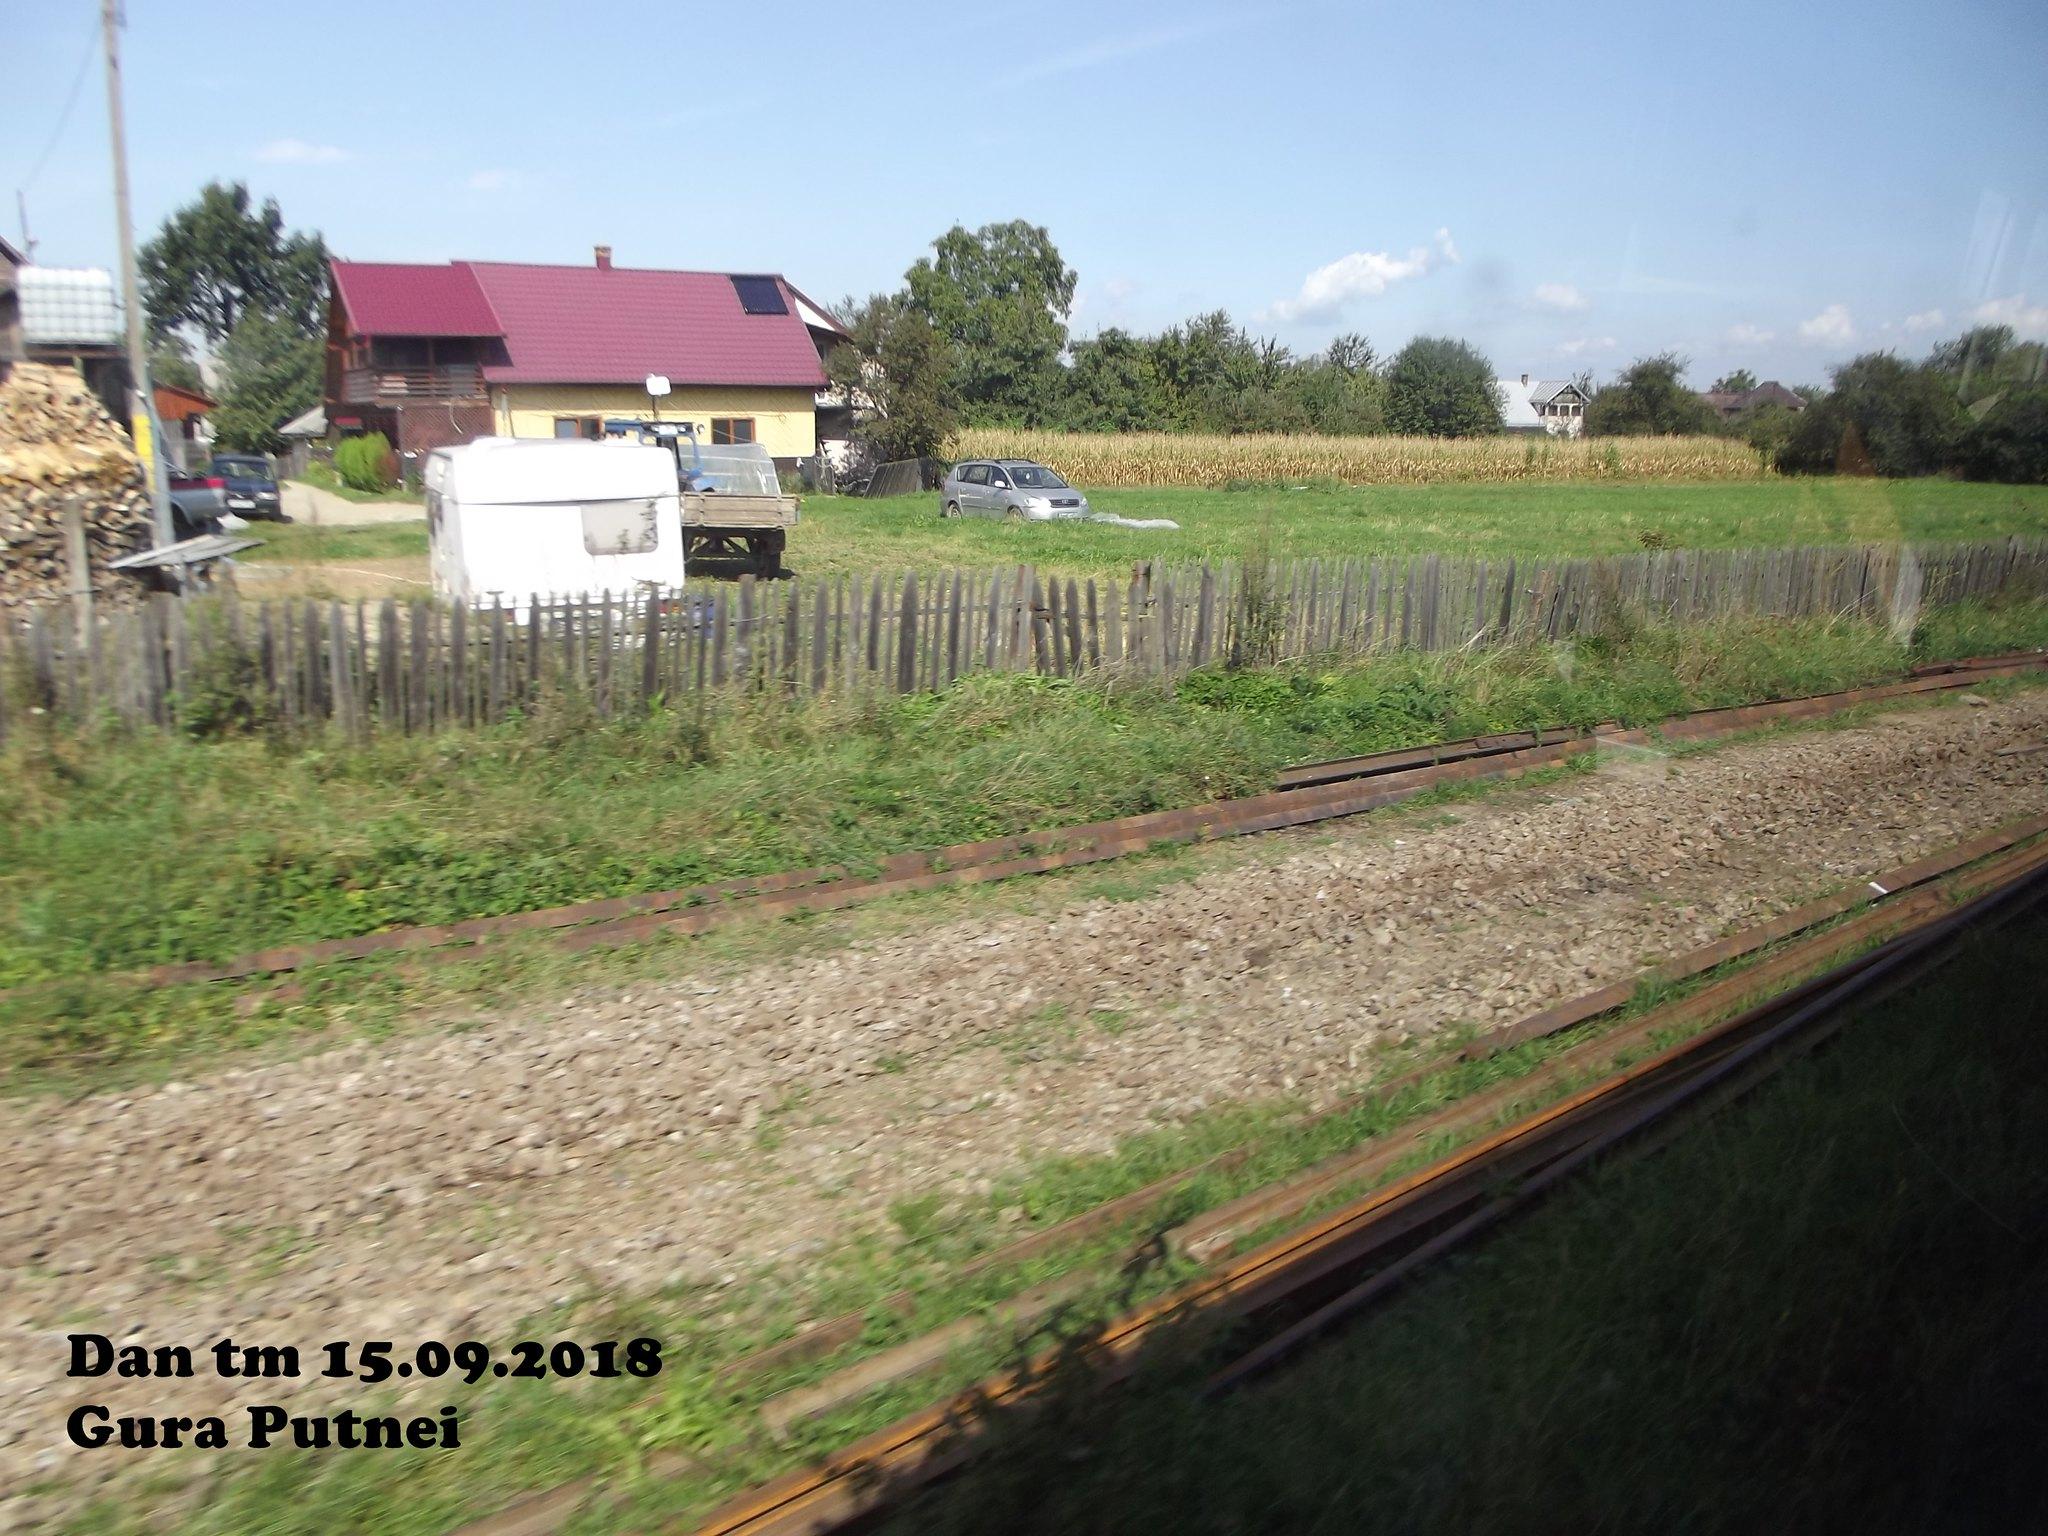 515 : Dorneşti - Gura Putnei - (Putna) - Nisipitu - Seletin UKR - Pagina 47 44016740804_e581df9ff5_k